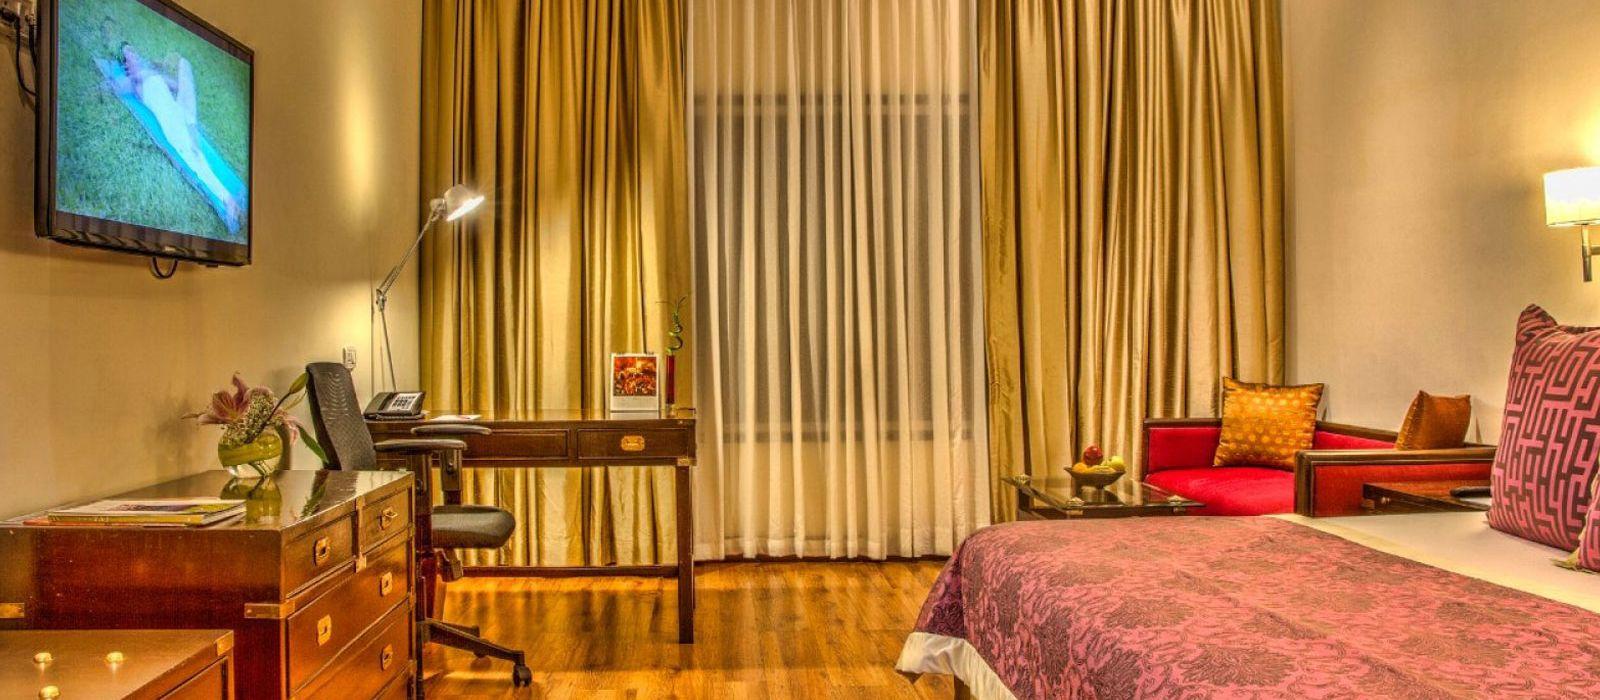 Hotel The Gateway  Ambad Nashik Zentral- & Westindien